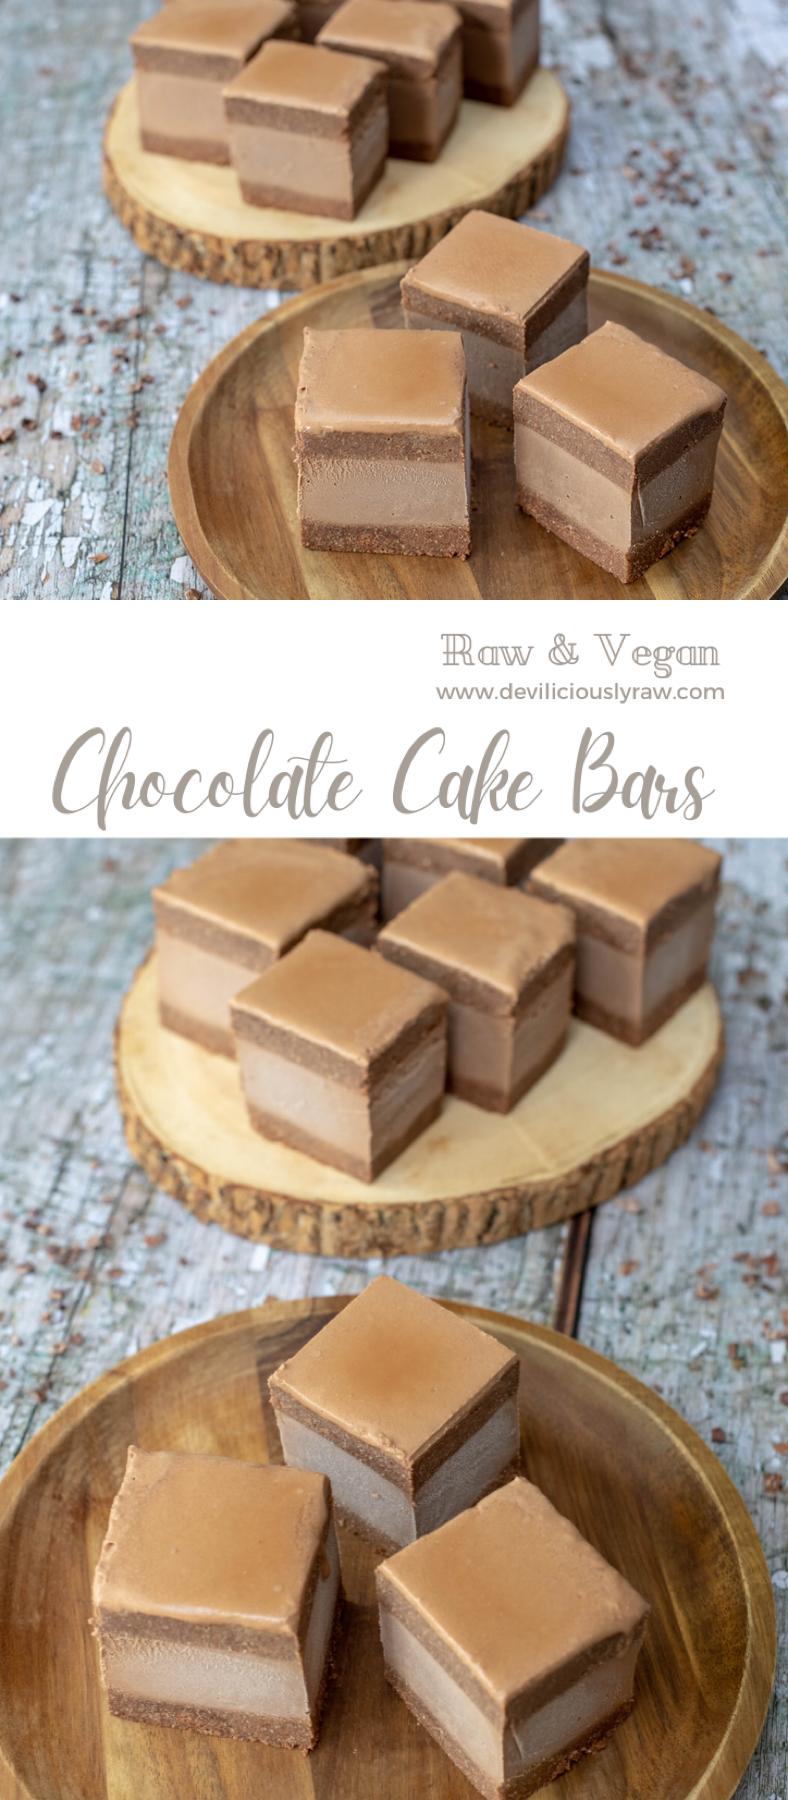 Chocolate Cake Bars